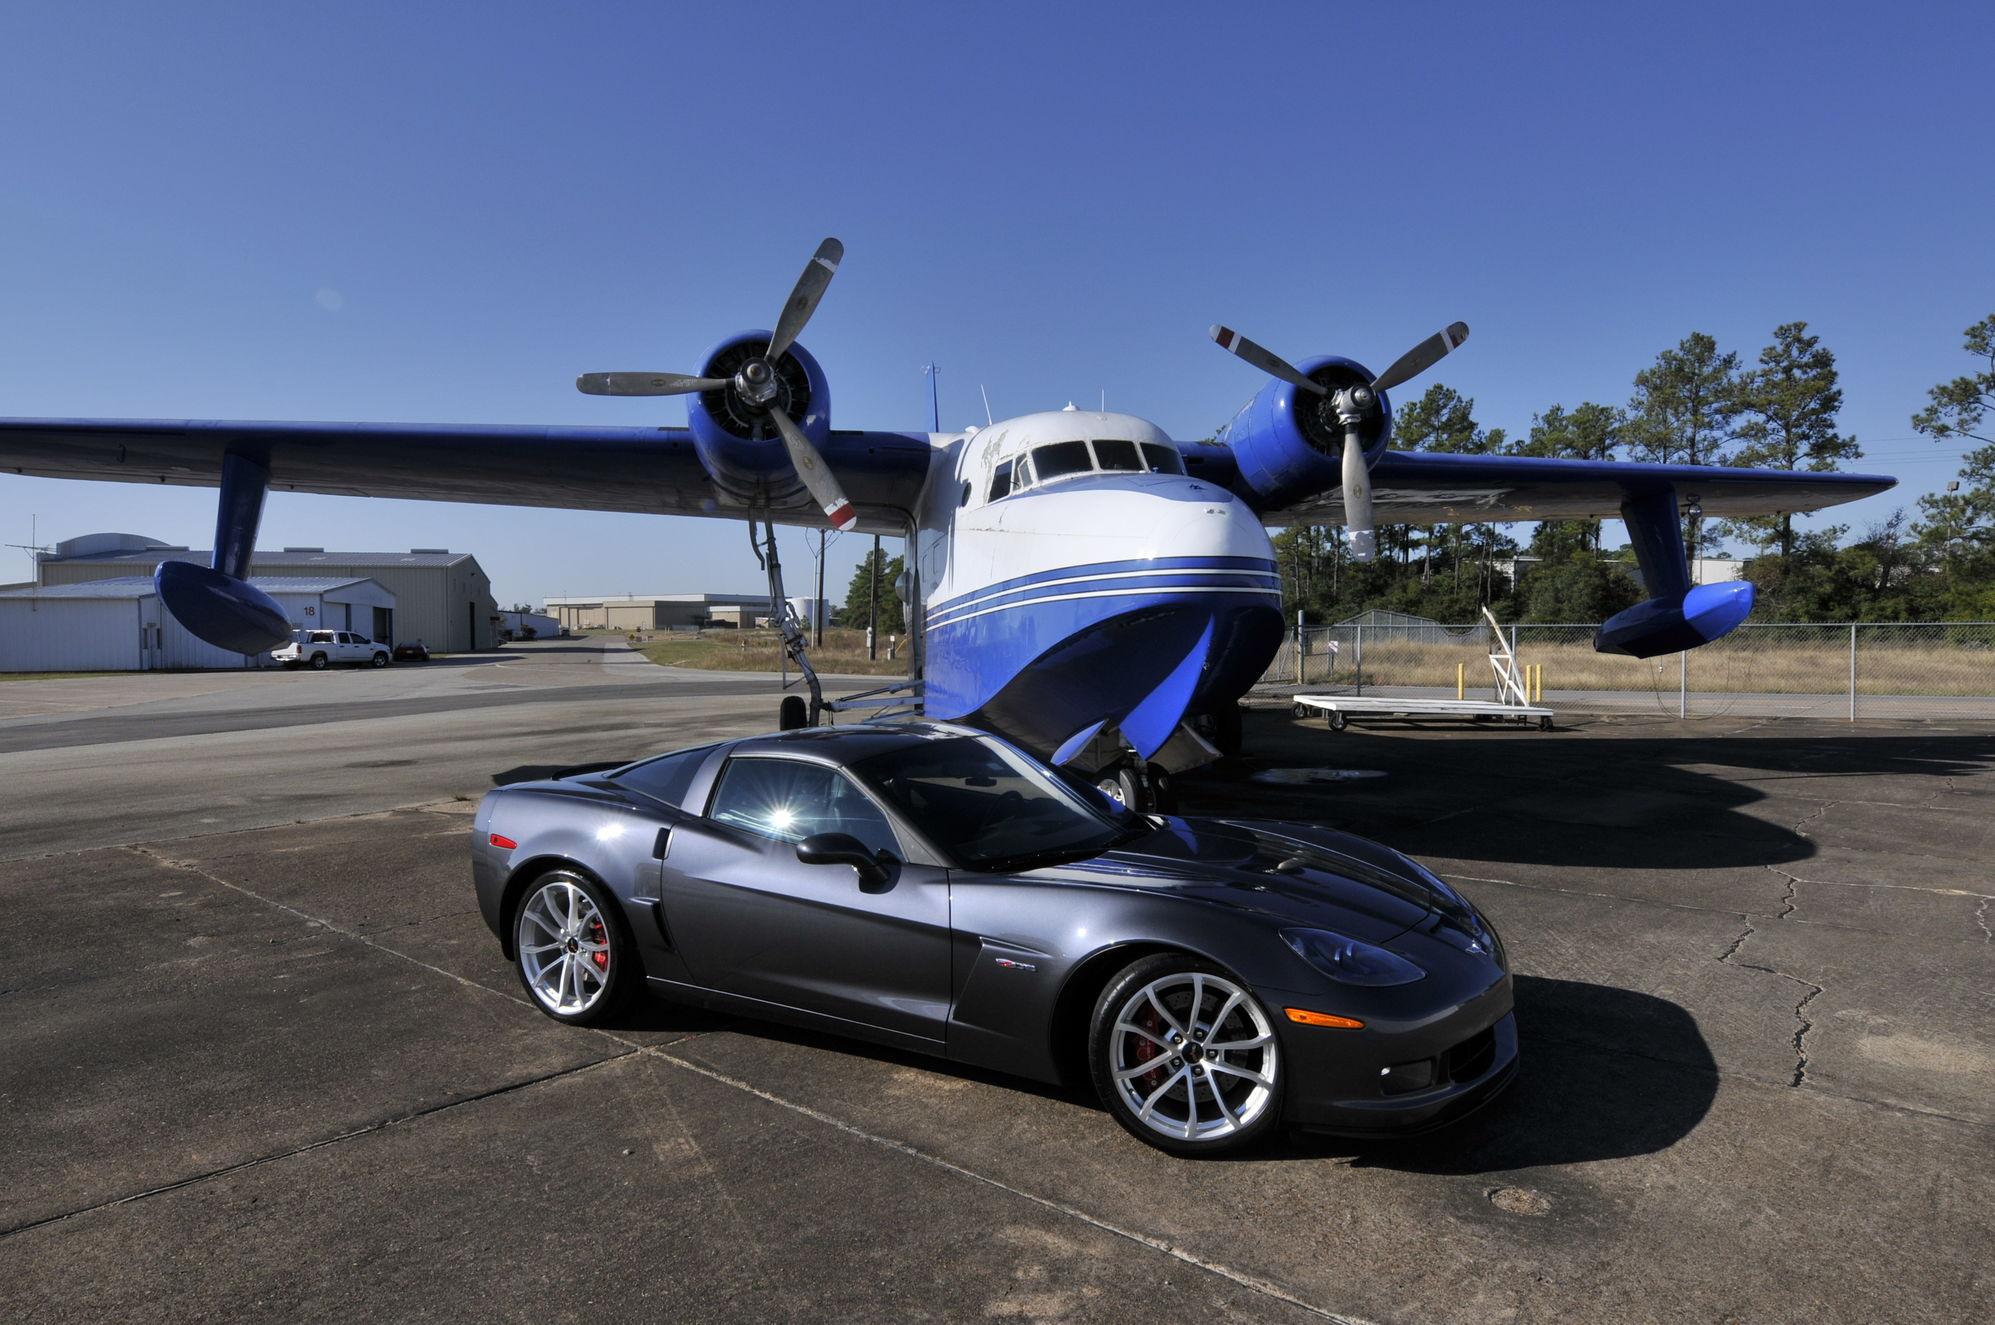 2015 corvette zo6 for sale in texas autos post. Black Bedroom Furniture Sets. Home Design Ideas